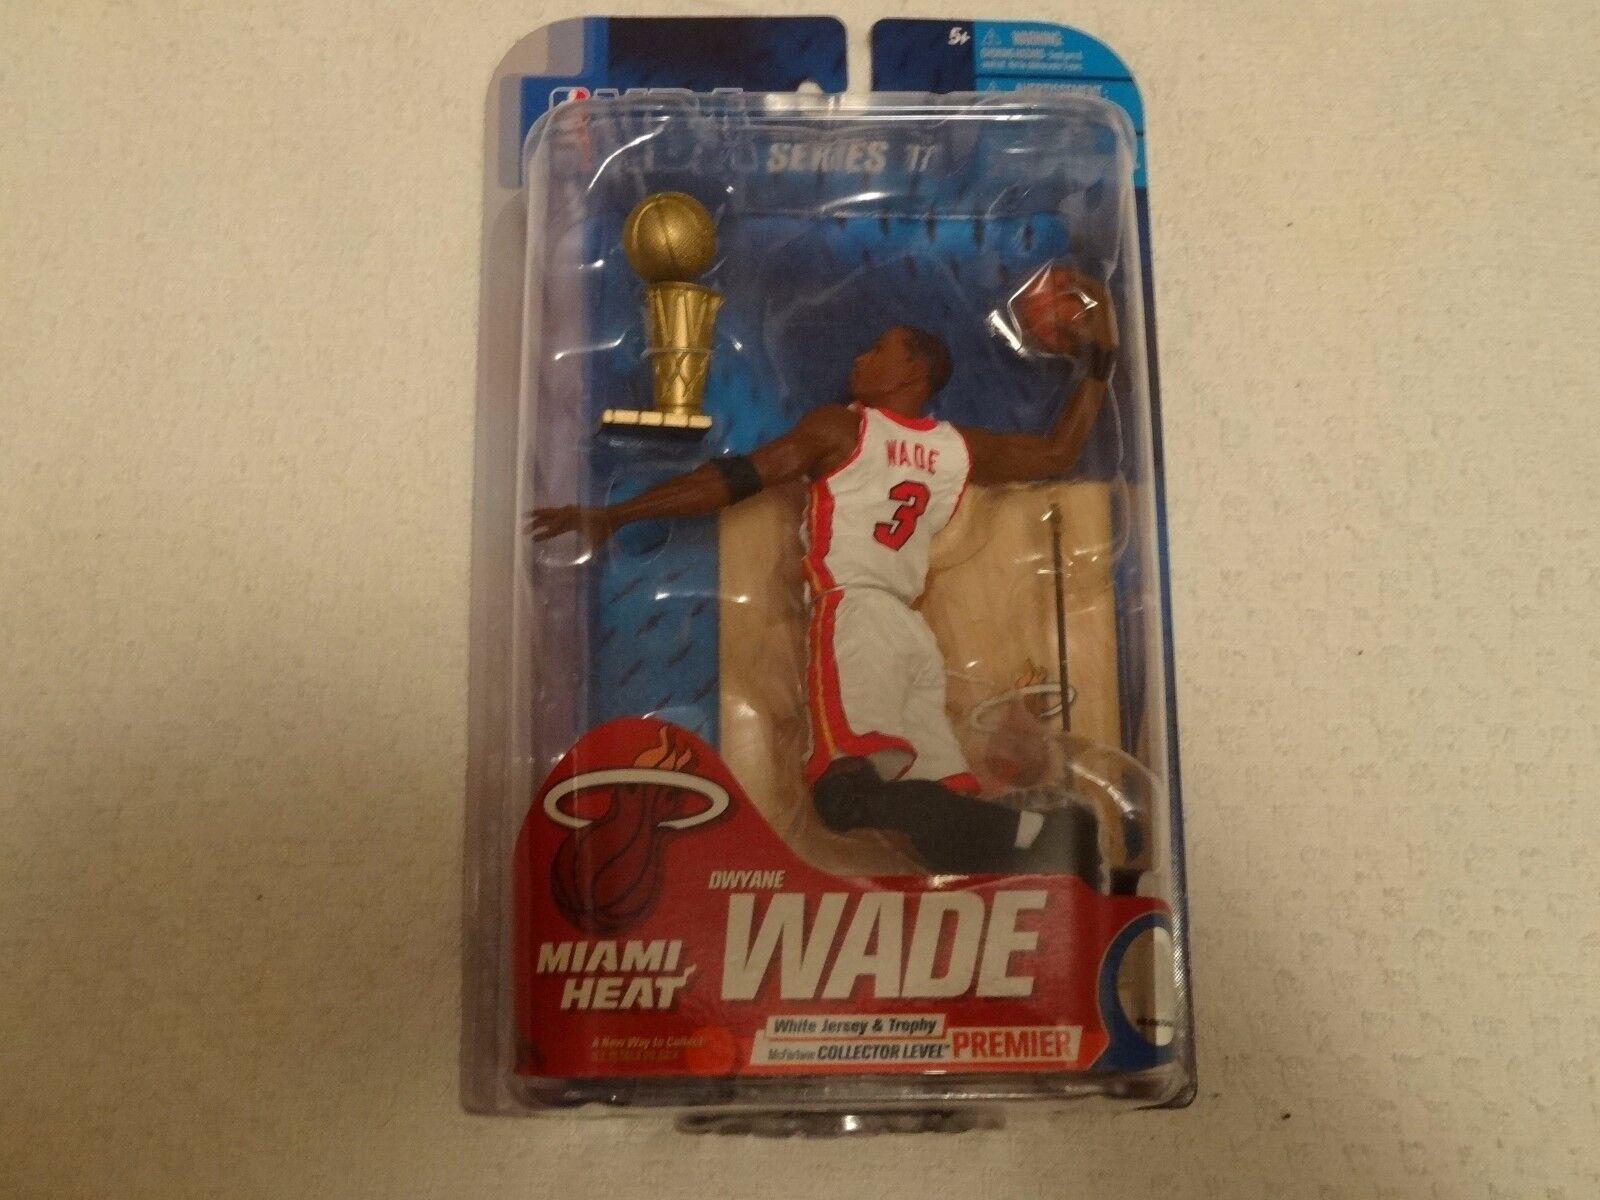 DWYANE WADE Miami Heat NBA Series 17 McFarlane Variant bianca Premium  194 250